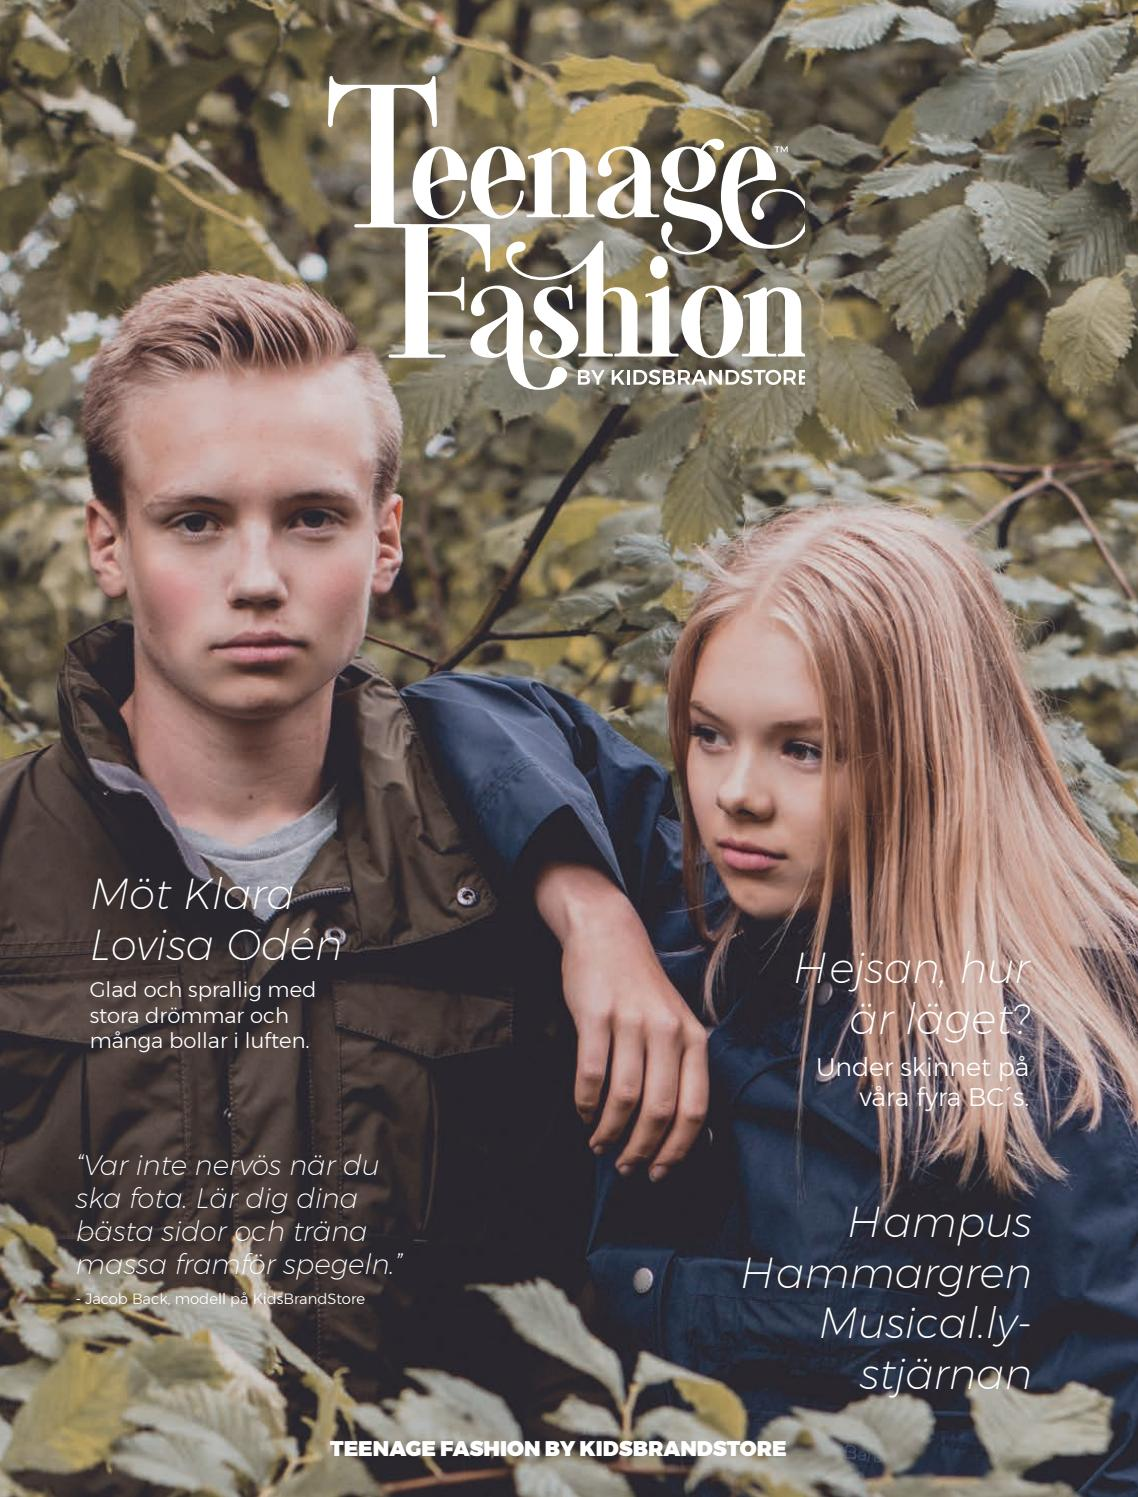 Teenage Fashion by KidsBrandStore by KidsBrandStore - issuu 197af7675dcc7